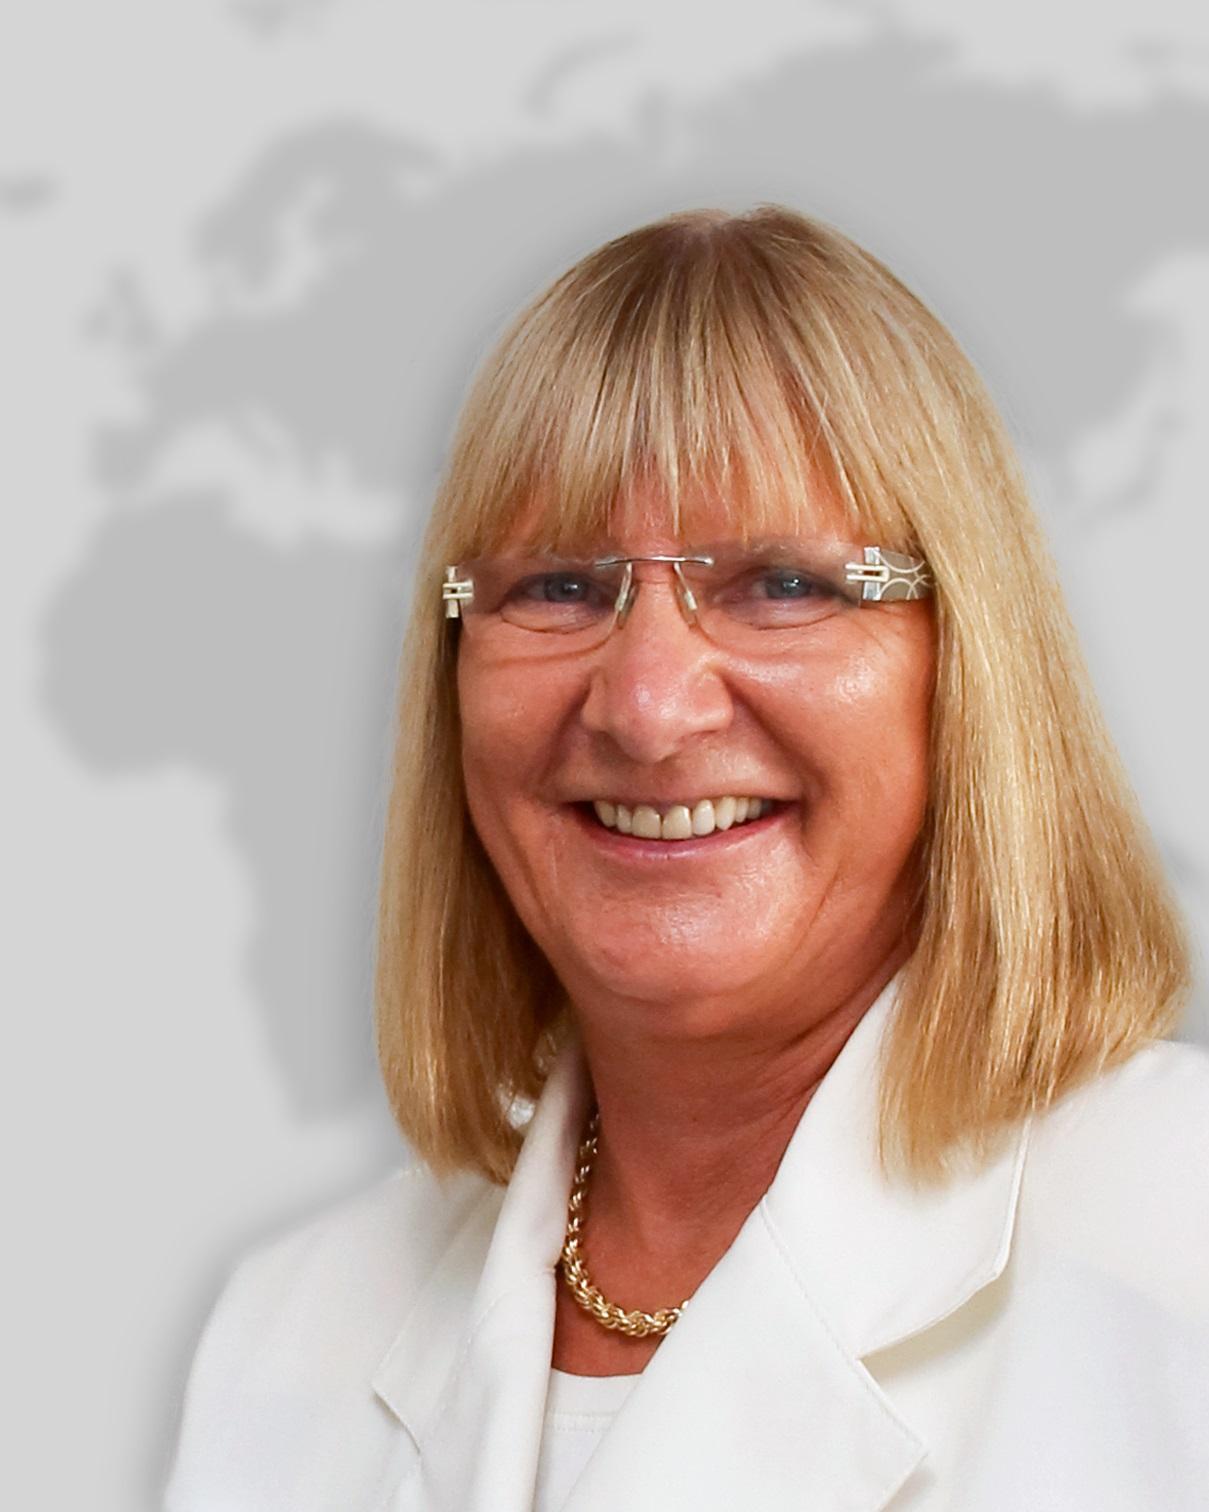 Karin Wiemers